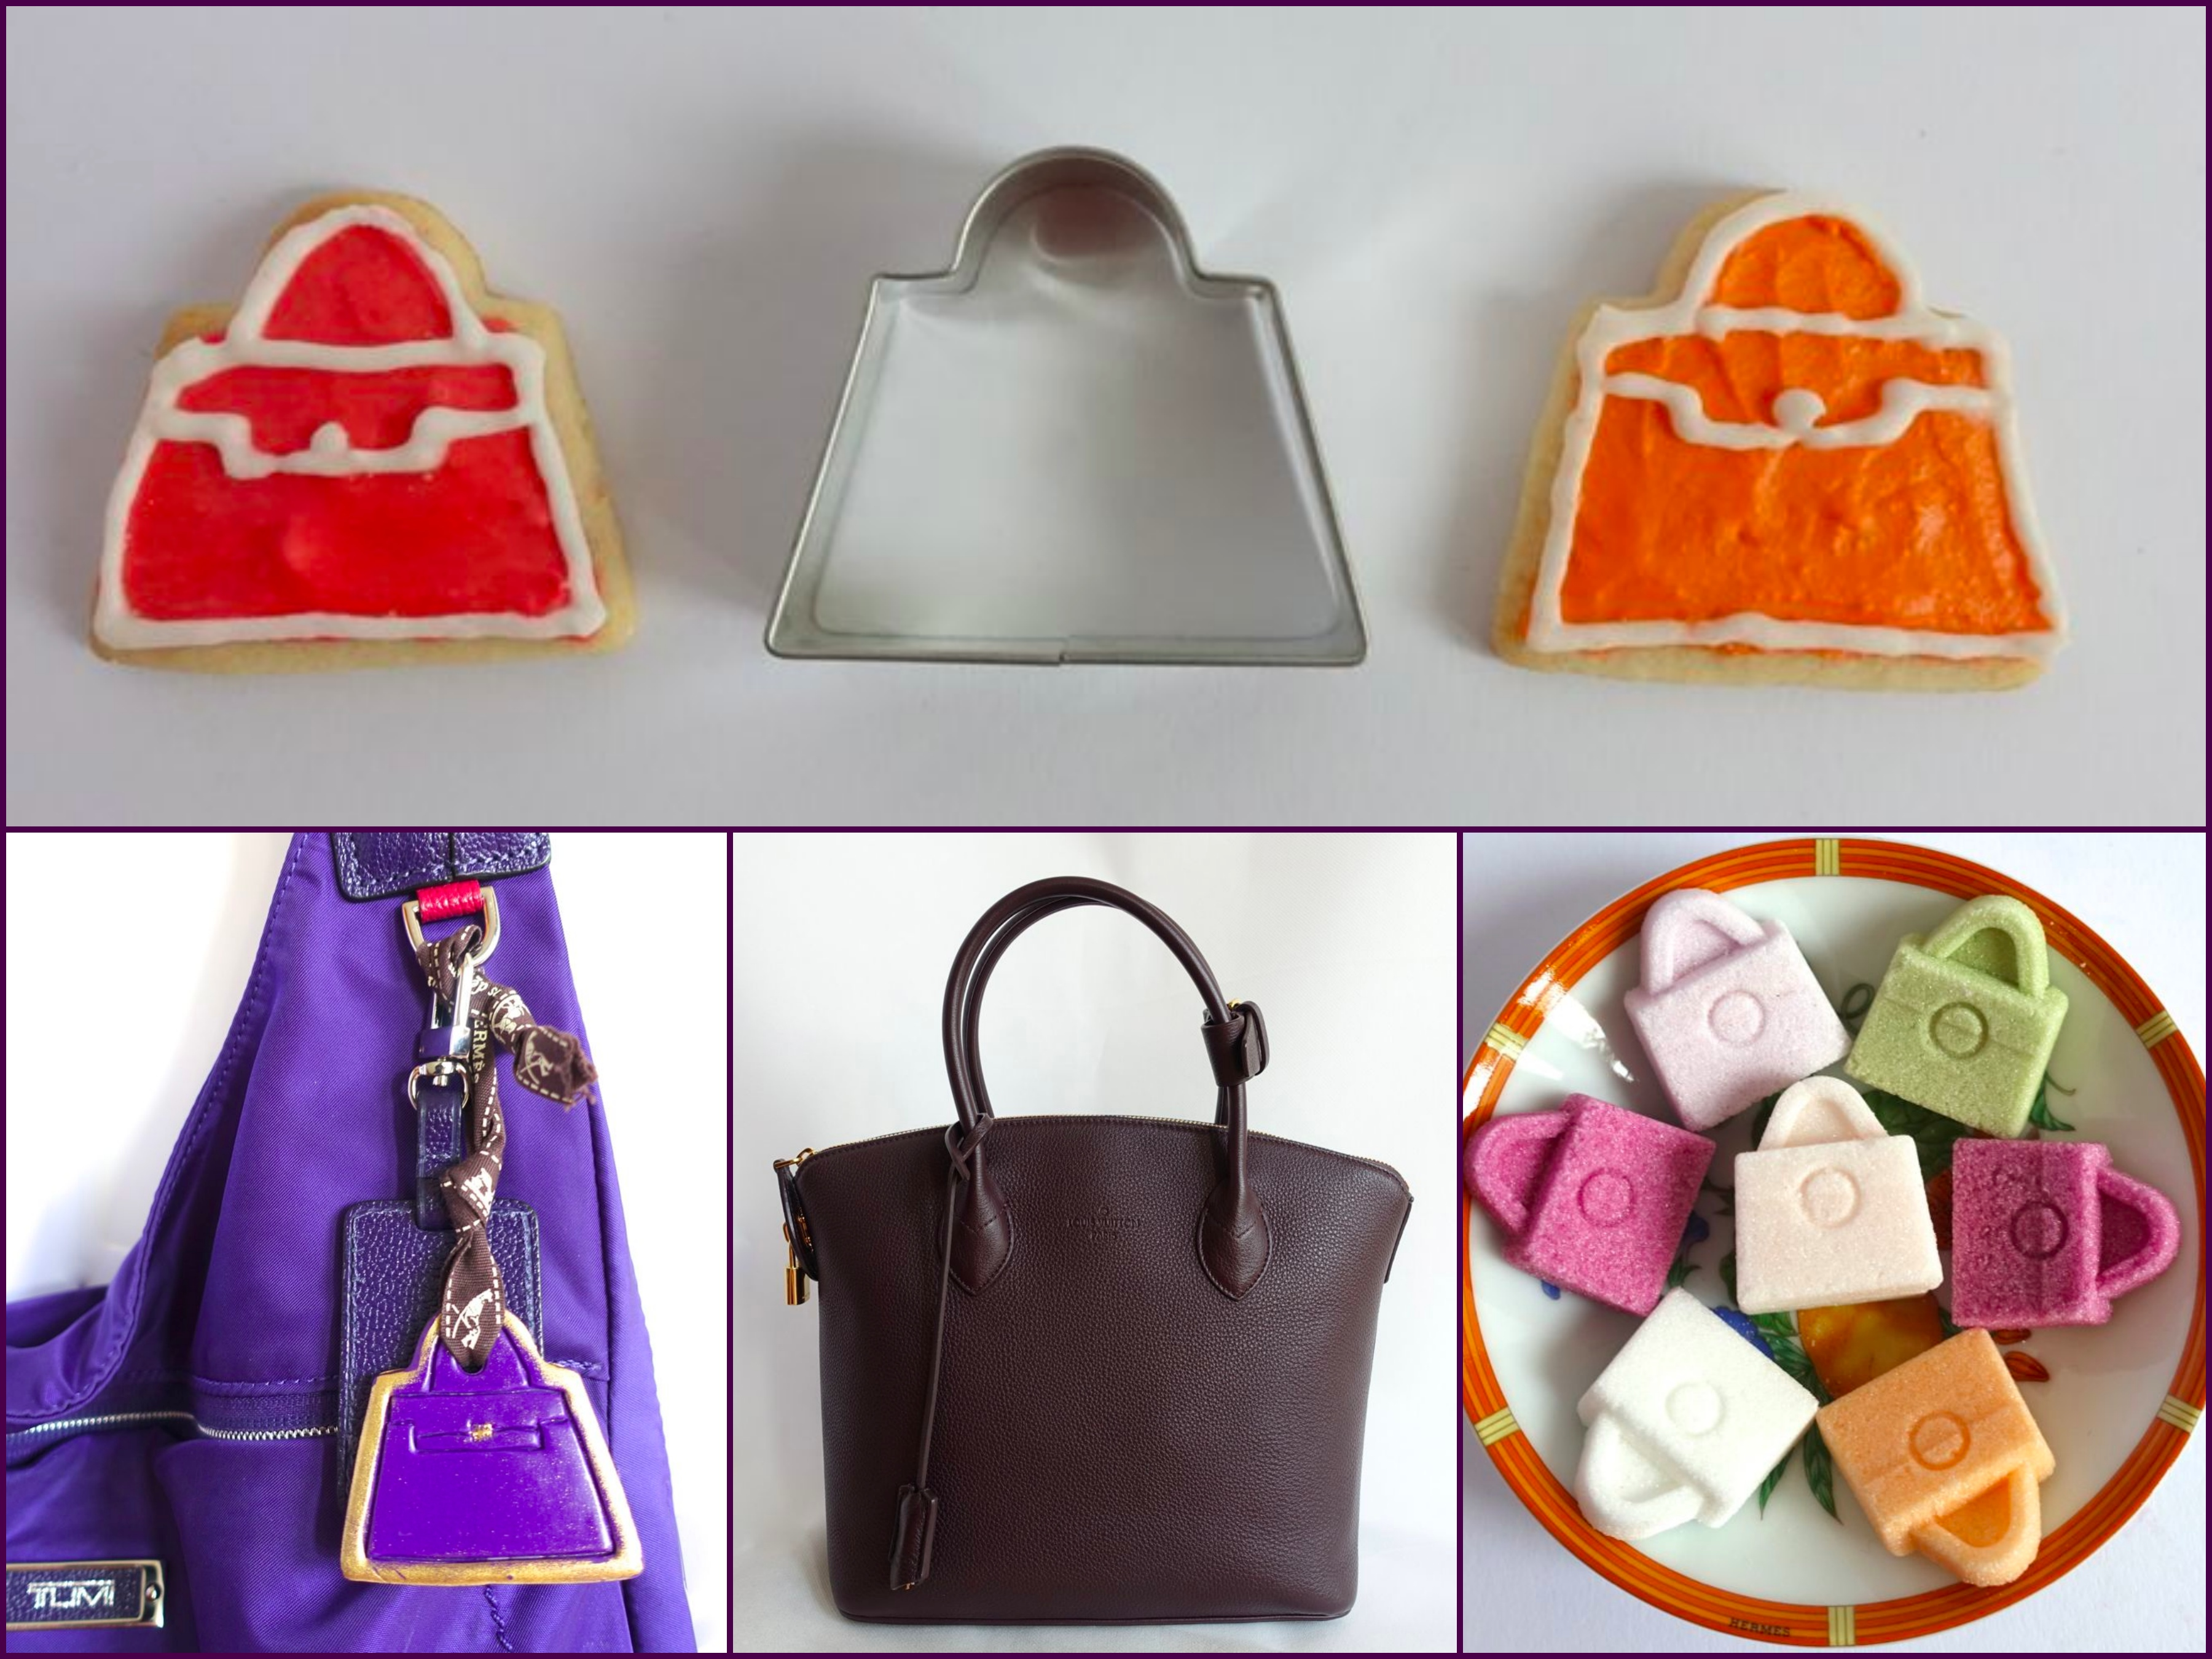 Jede Frau braucht eine Tasche / Every woman needs a bag